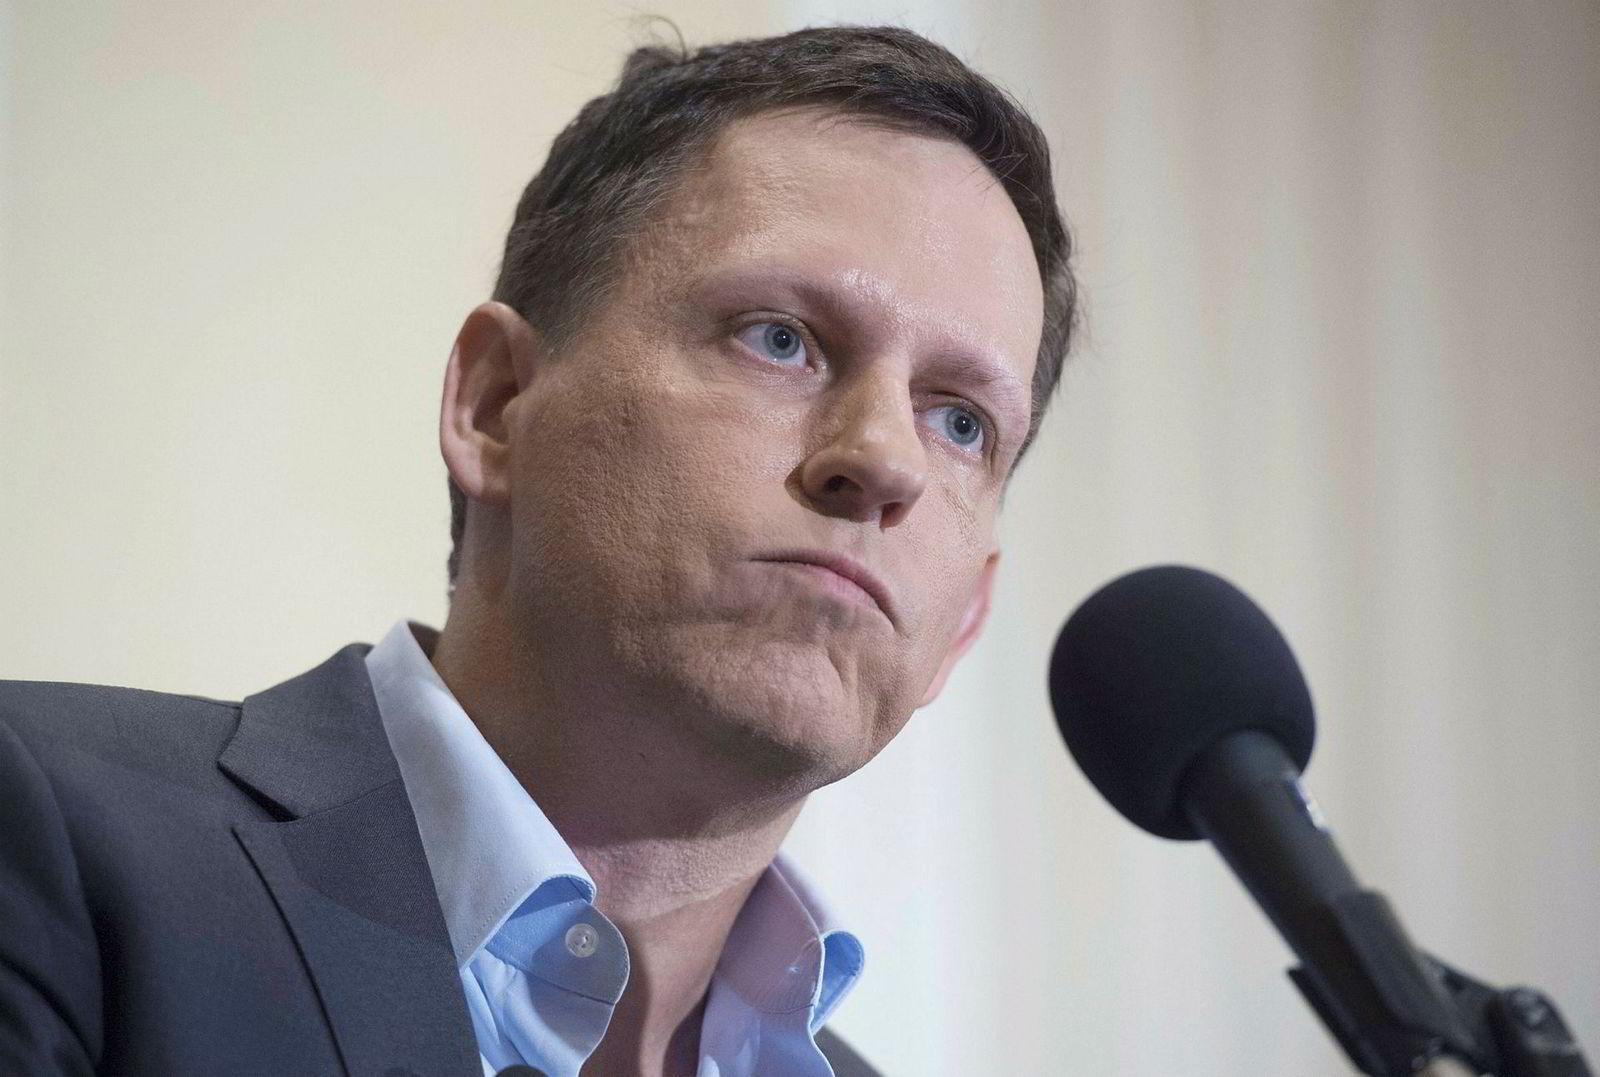 PayPal-gründer og venturekapitalist Peter Thiel står bak Founders Fund.